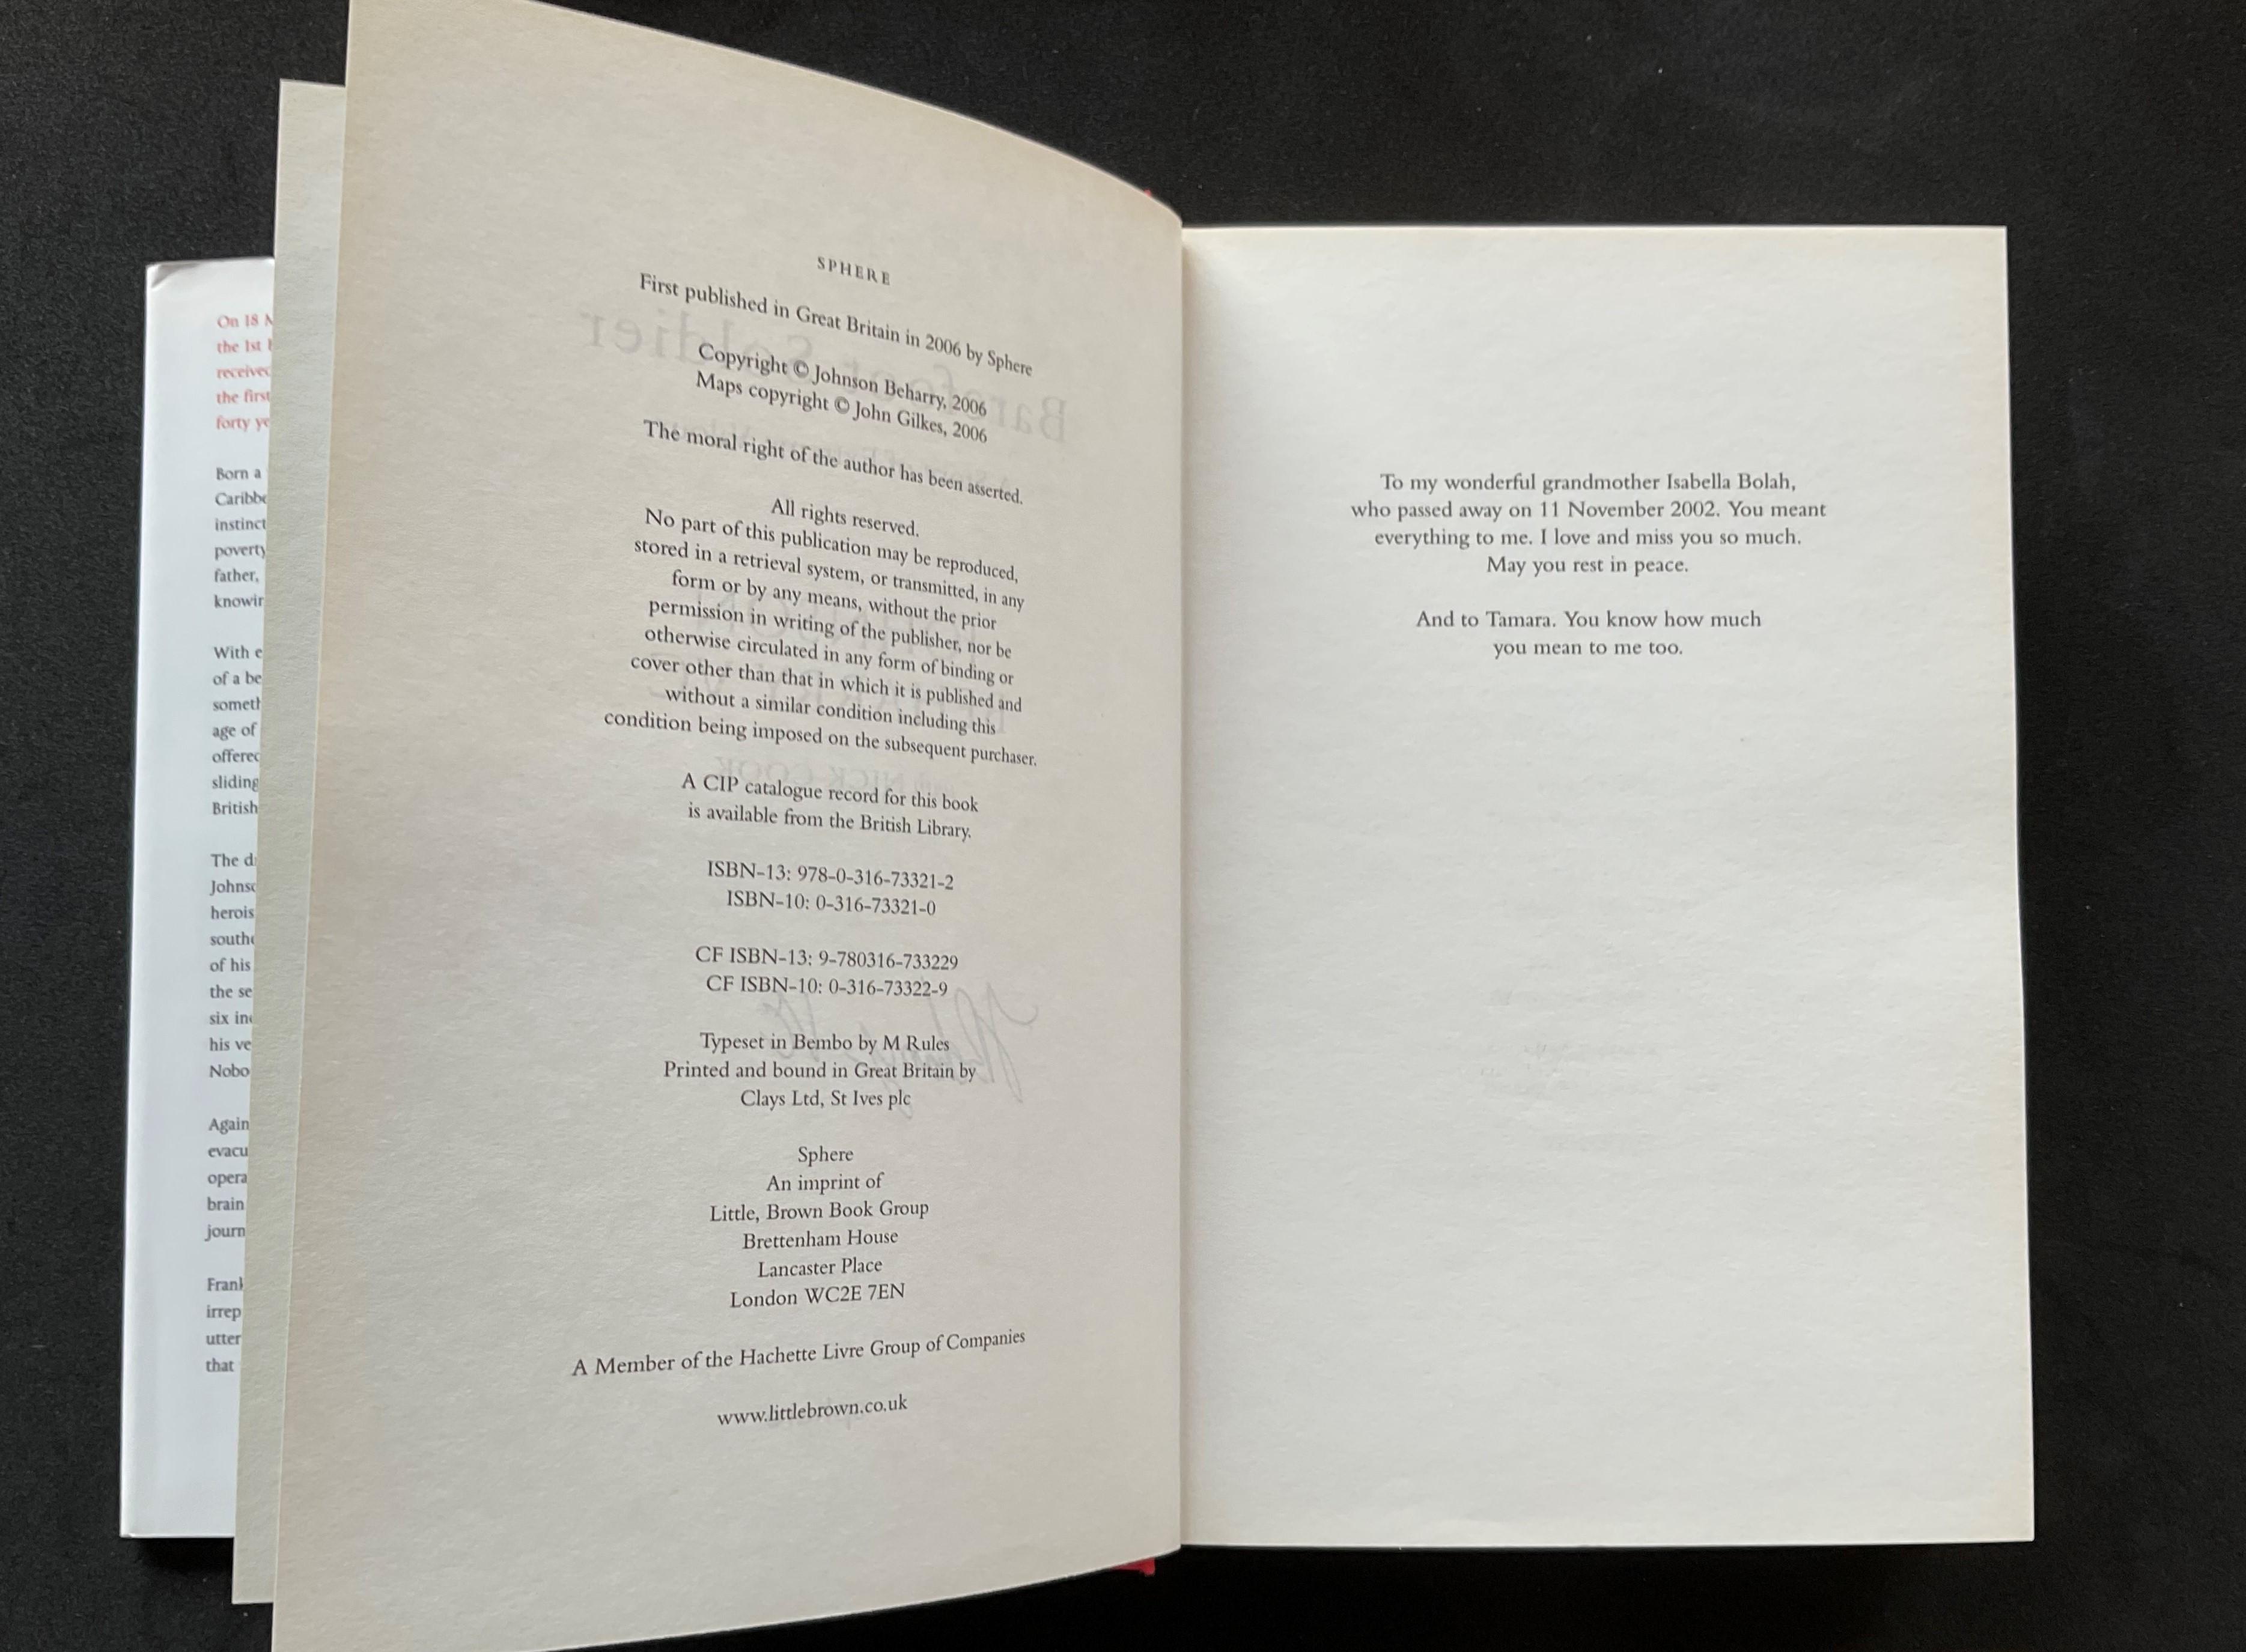 Colour Sergeant Johnson Beharry VCs autobiography Barefoot Soldier signed hardback copy. Colour - Image 3 of 3